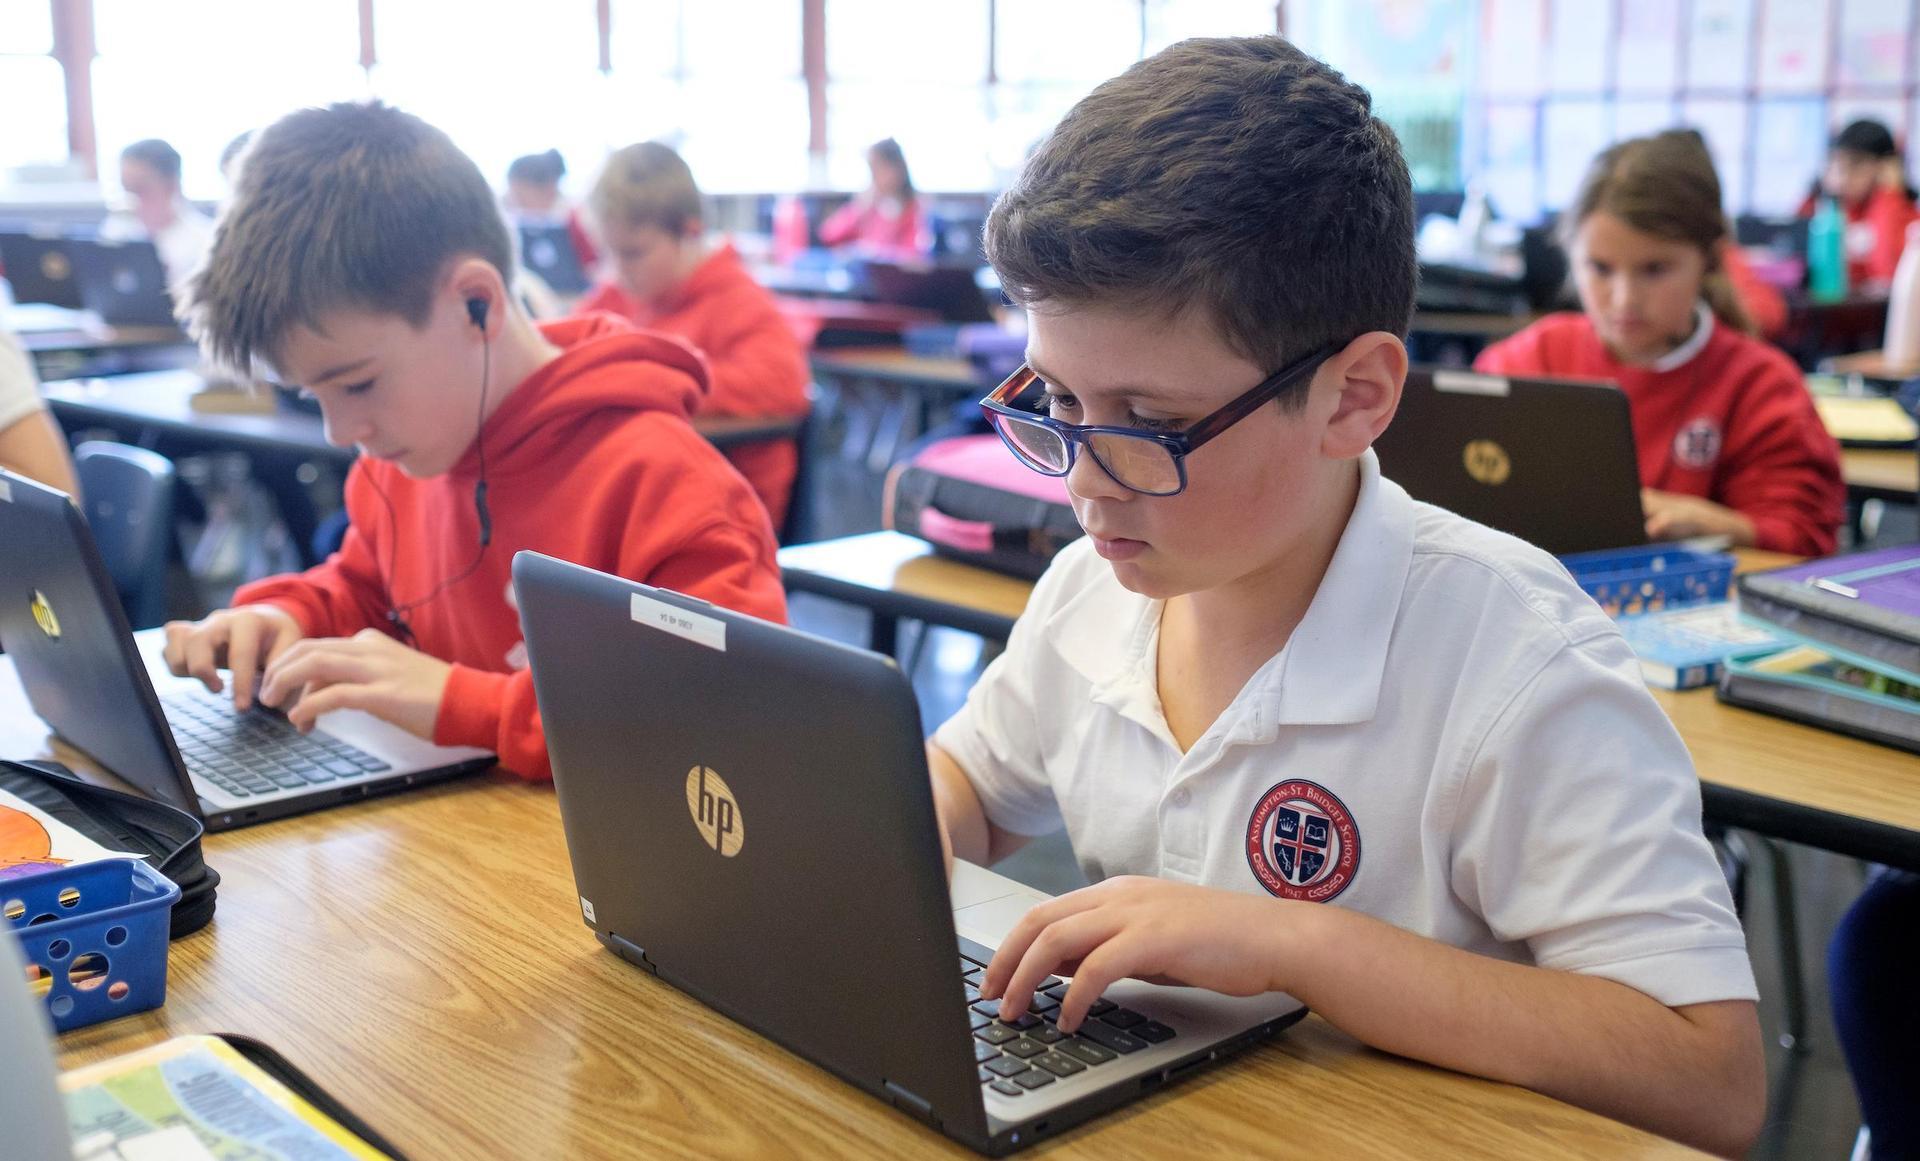 boys at laptop